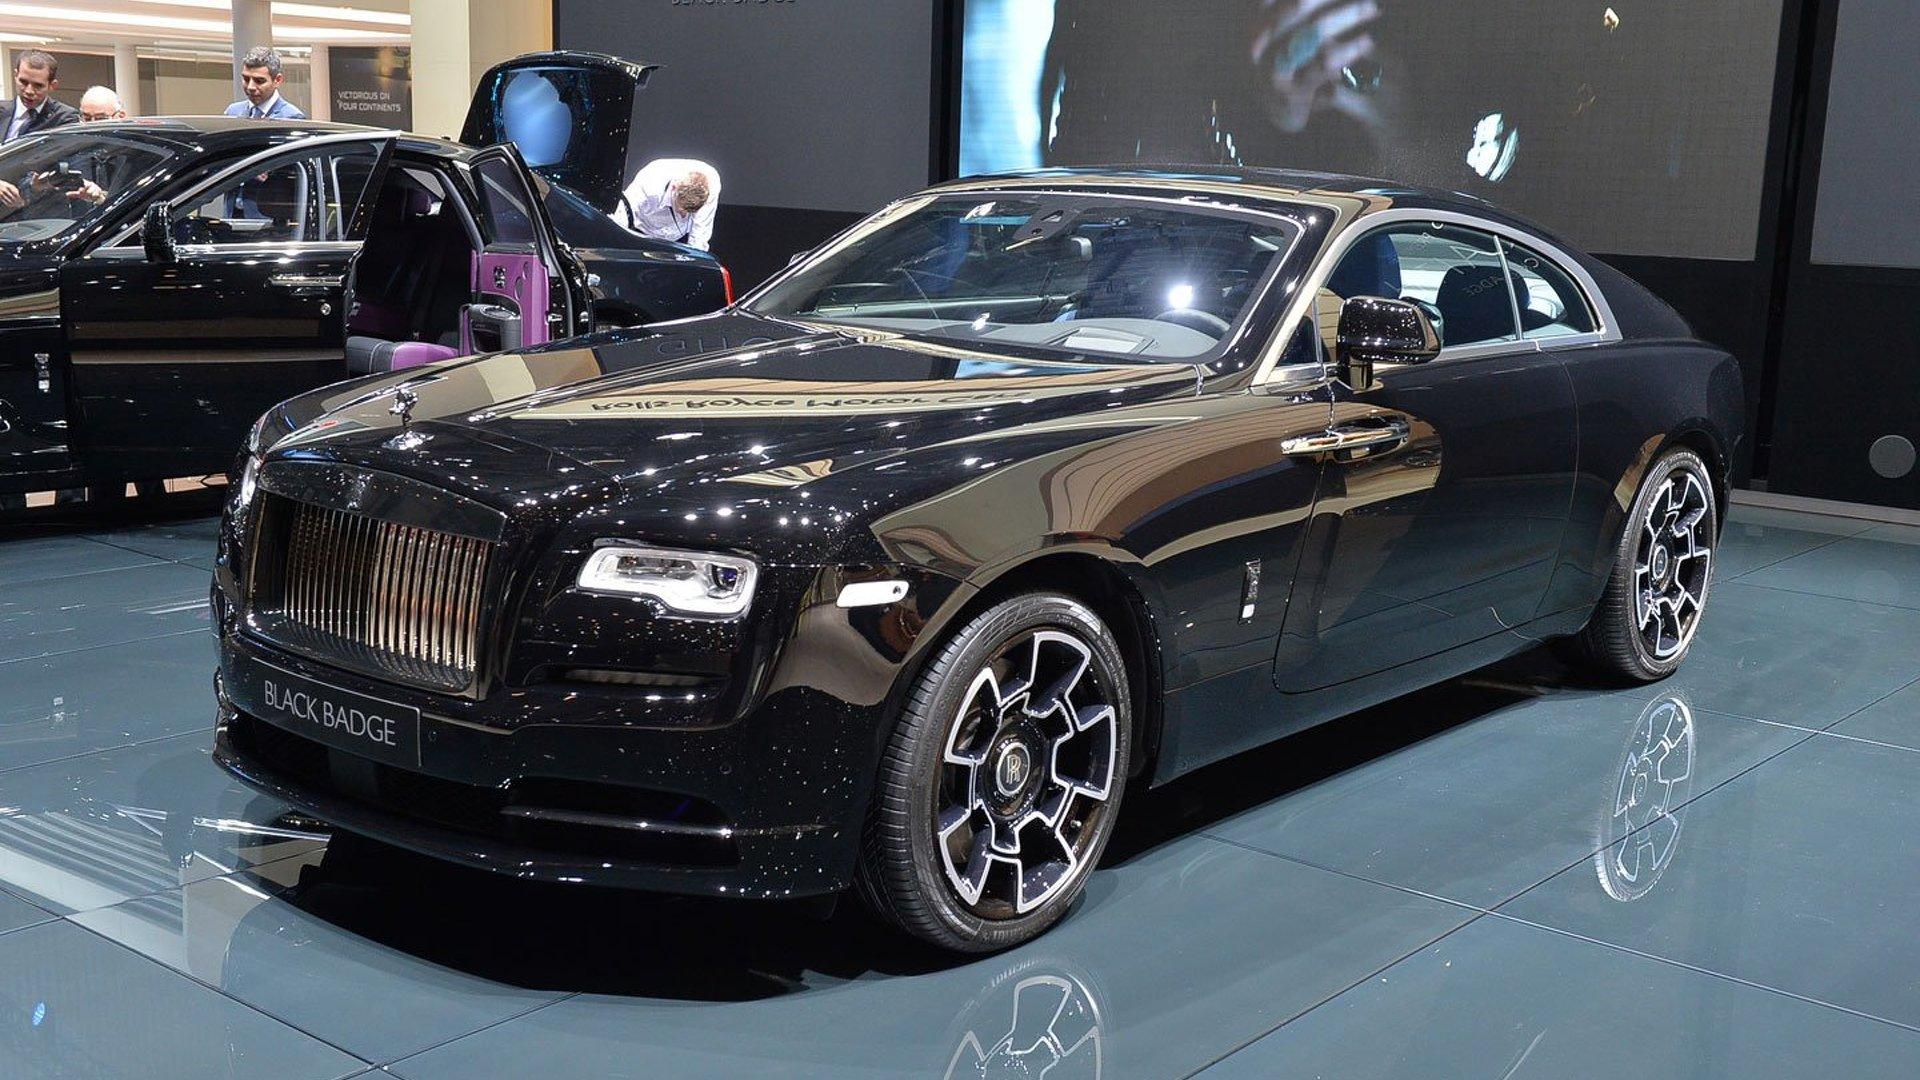 2013 NYIAS: Rolls-Royce Wraith, Phantom and Drophead